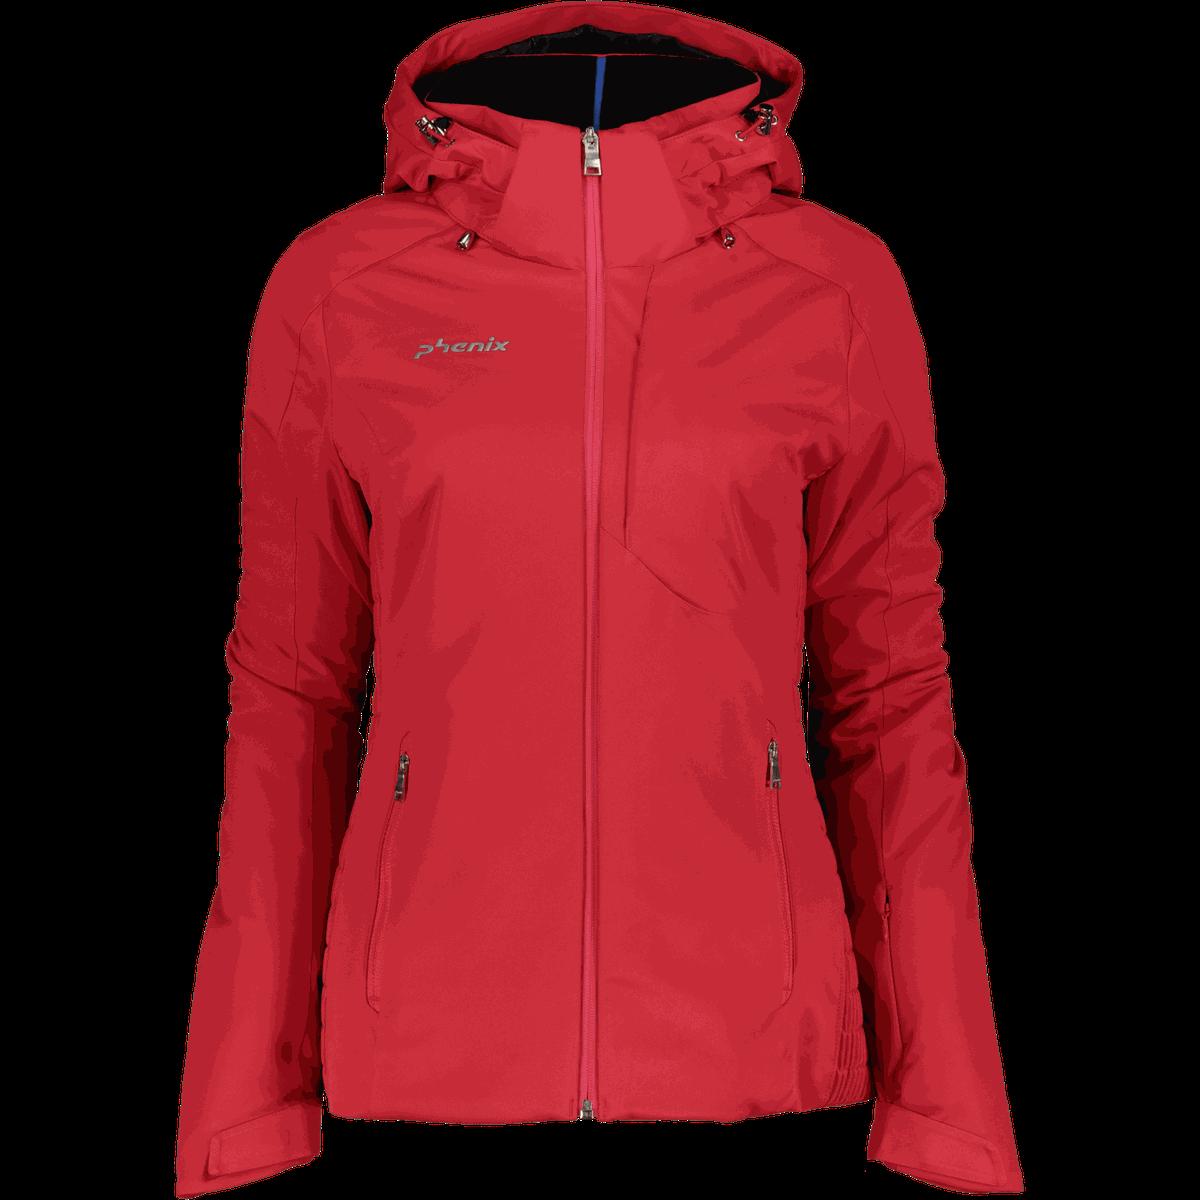 Hyggelig Phenix Maiko Jacket, skijakke dame - Rød - Ski og snowboardjakker PW-89